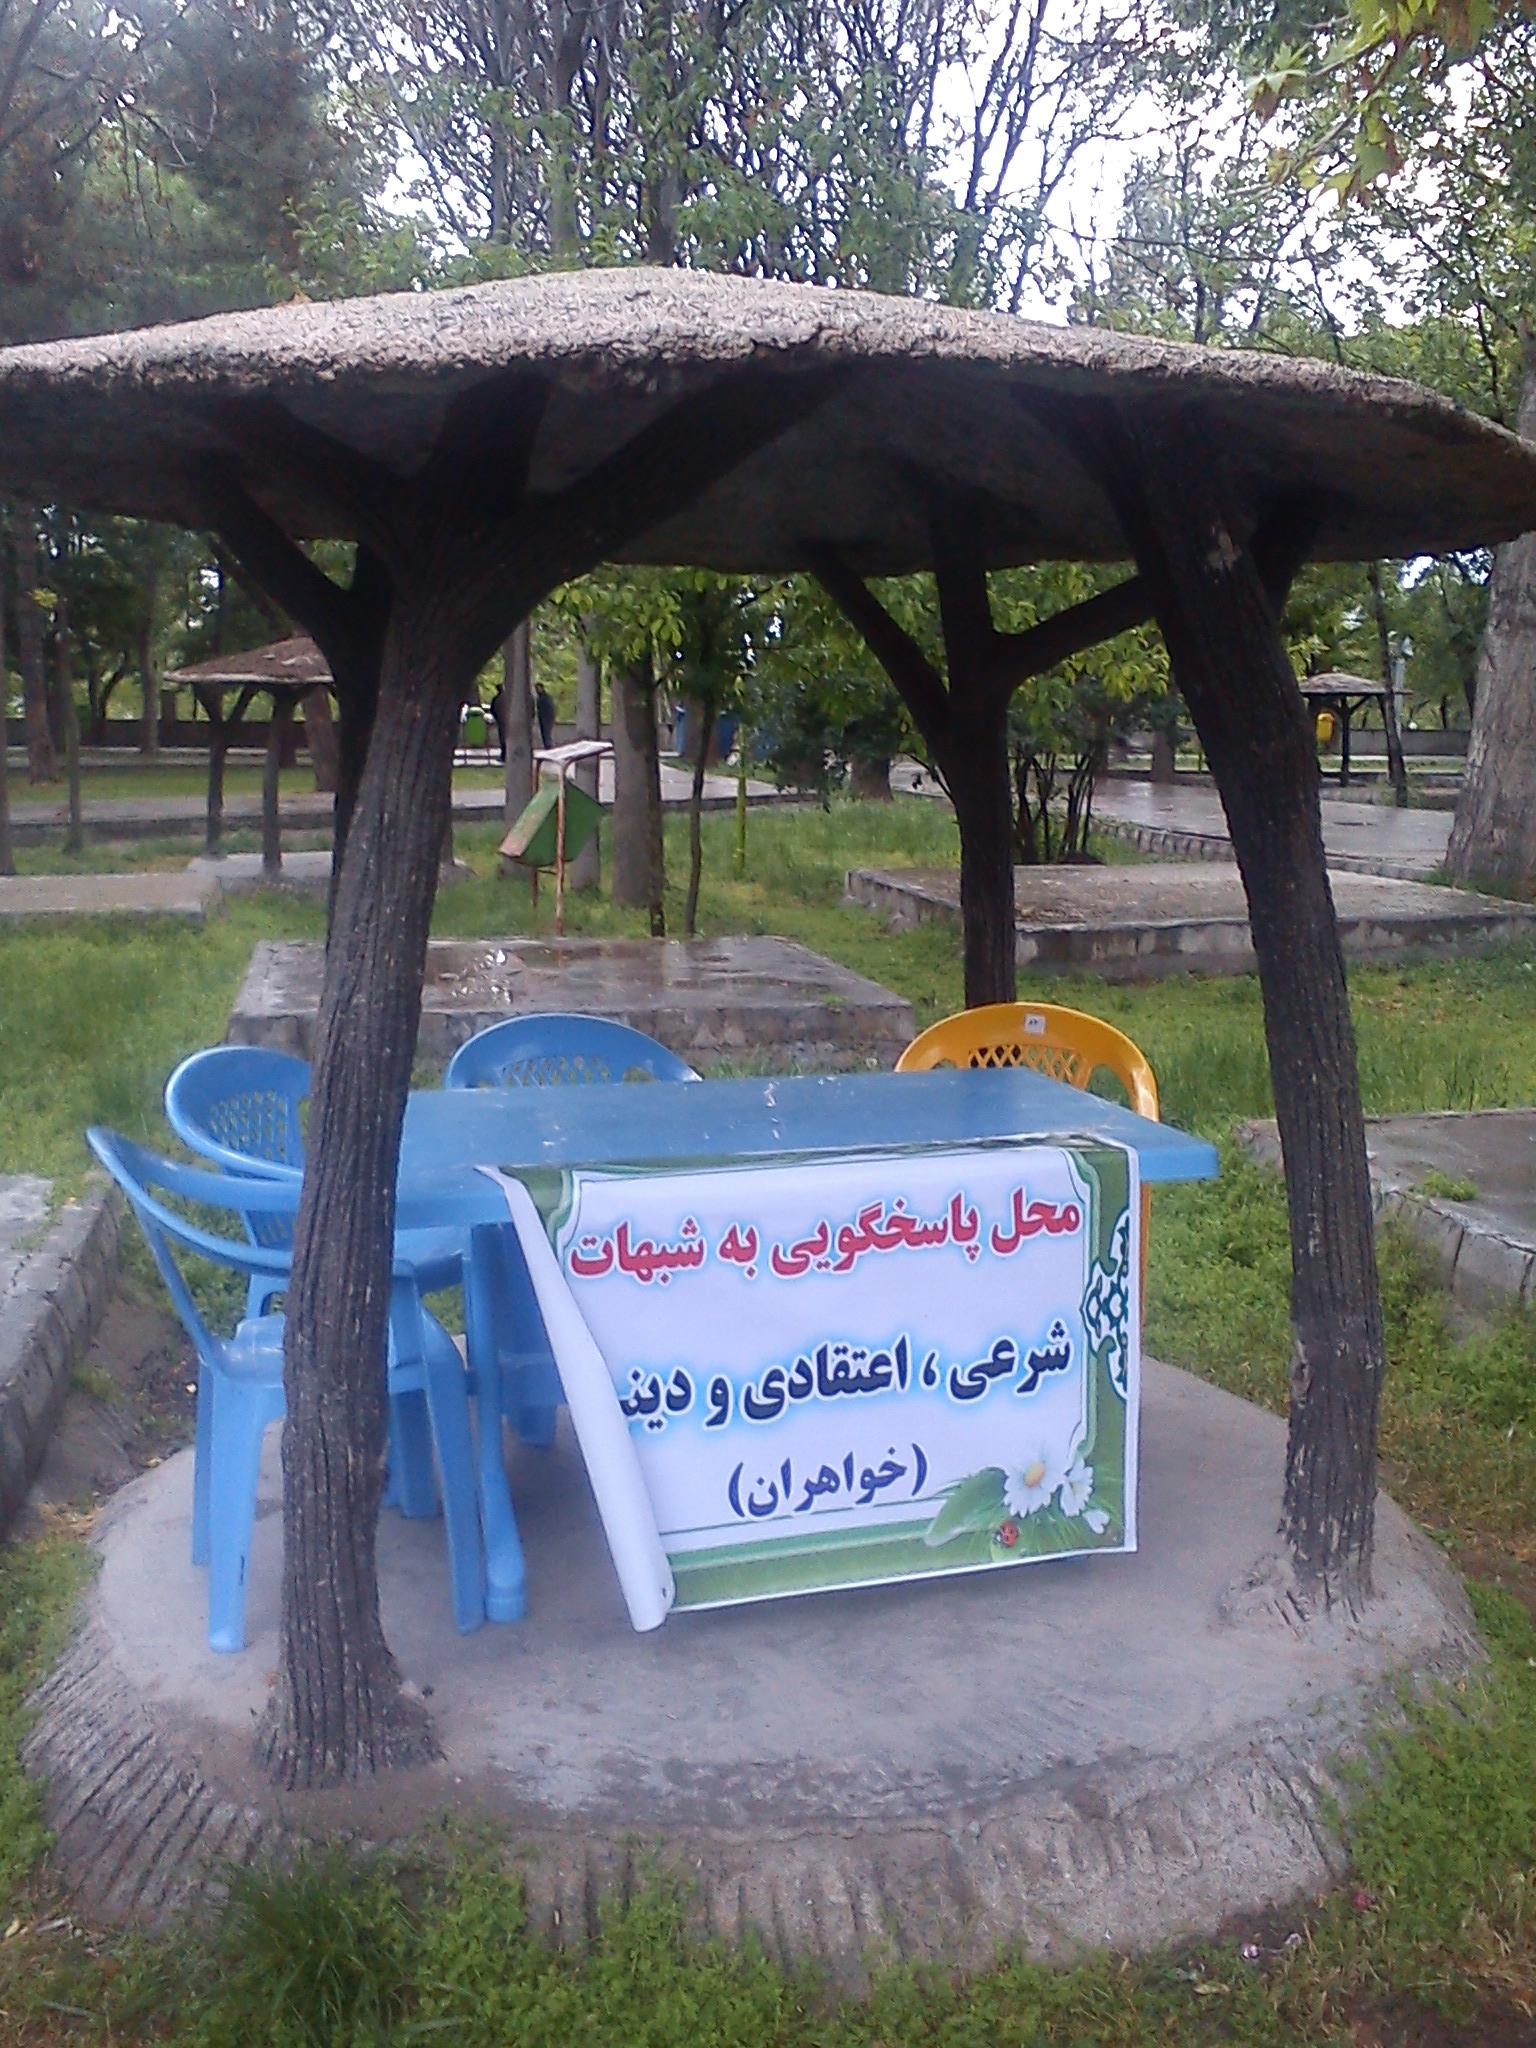 پارک شیخ شهاب الدین اهری رمضان 97